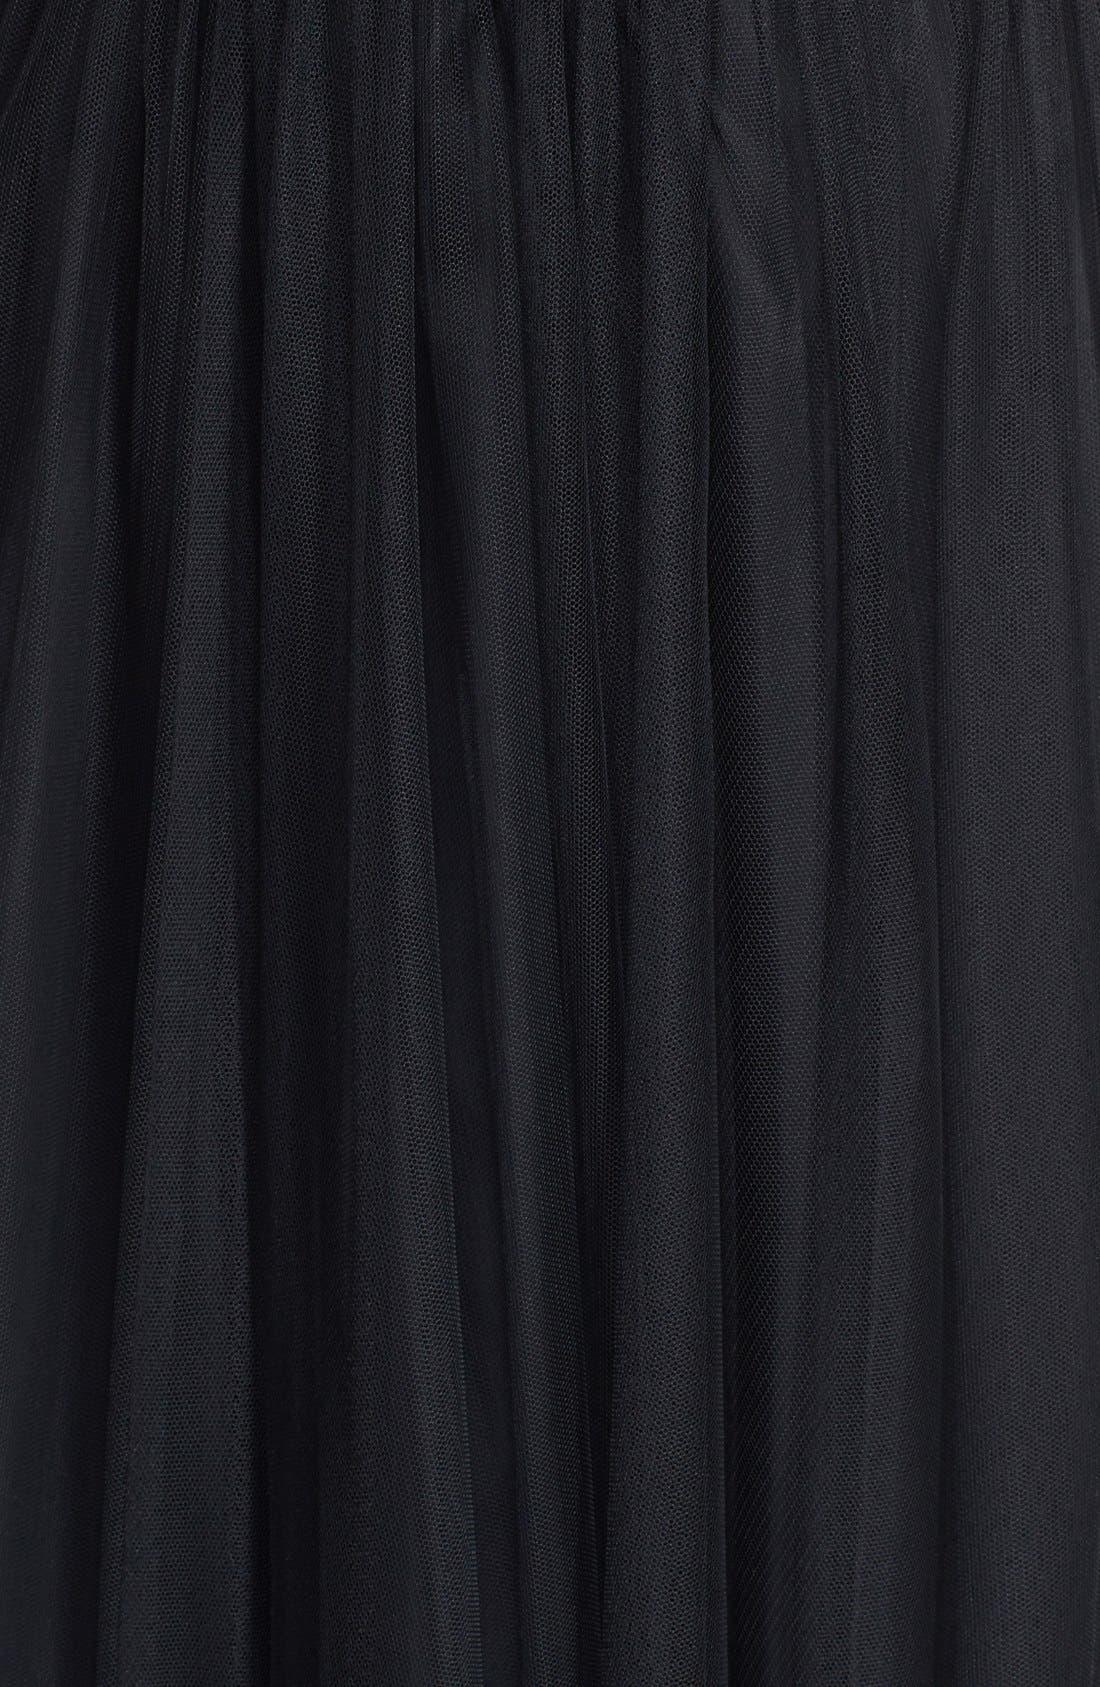 Alternate Image 3  - Aidan Mattox Embroidered Bodice Mesh Ballgown